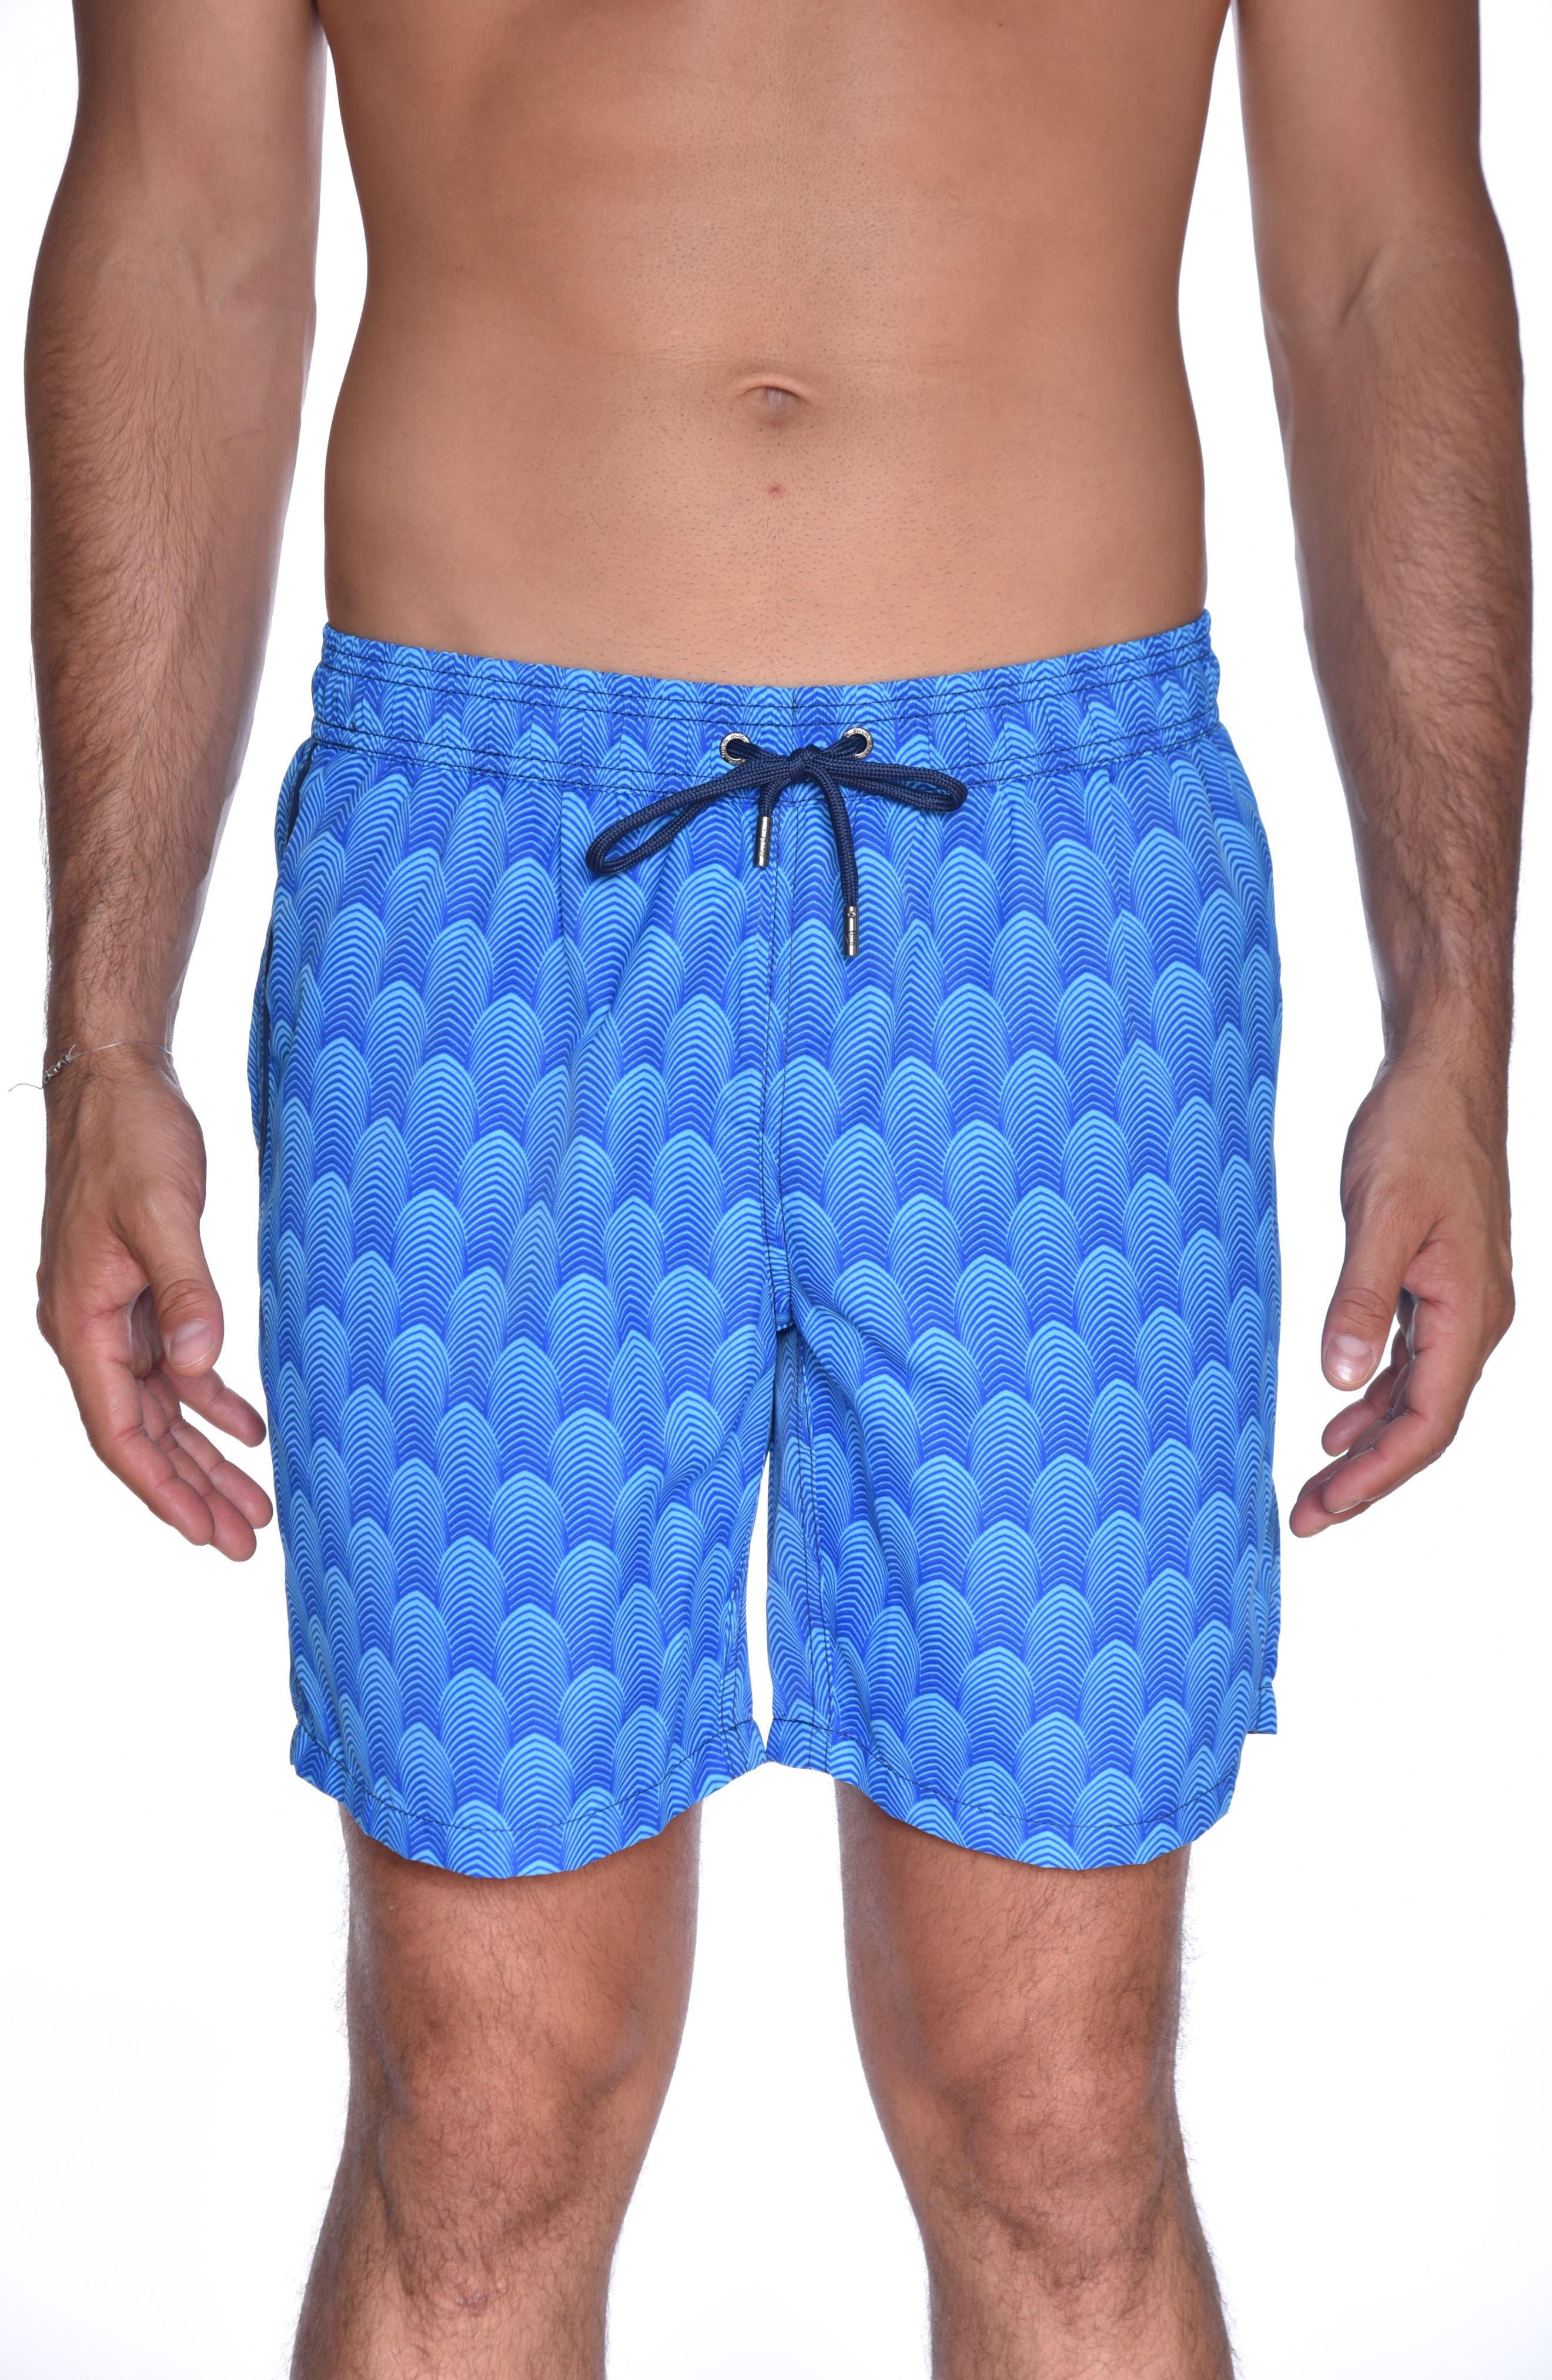 Mr. Swim Deco Print Swim Trunks,                         Main,                         color,